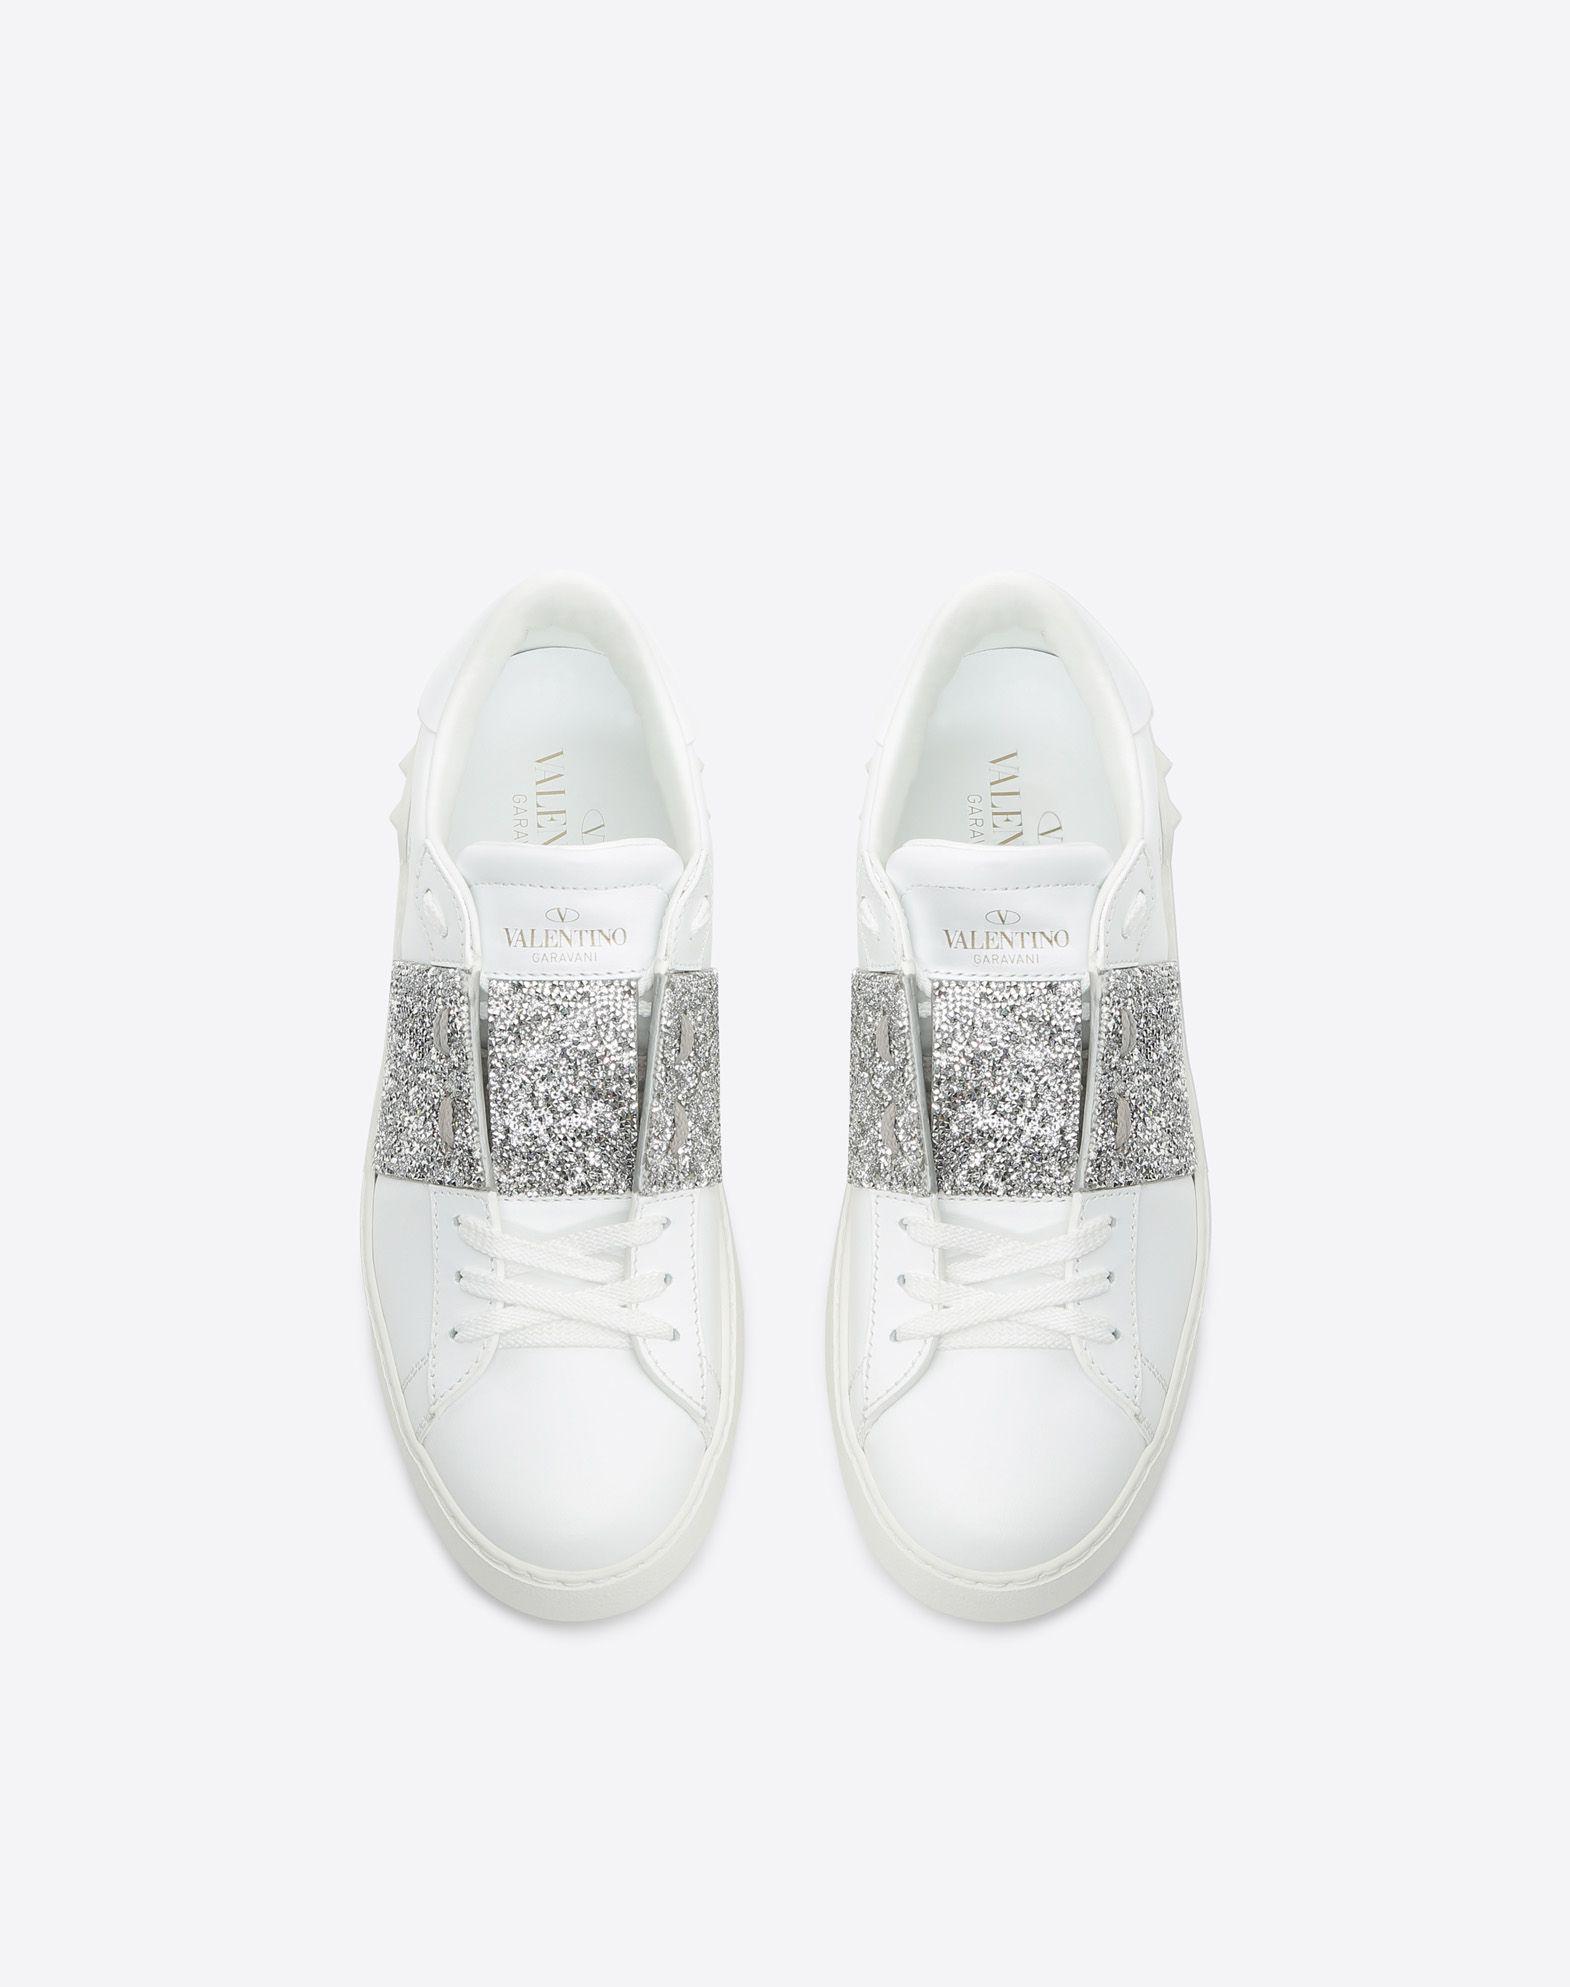 VALENTINO GARAVANI Open Sneaker LOW-TOP SNEAKERS D e